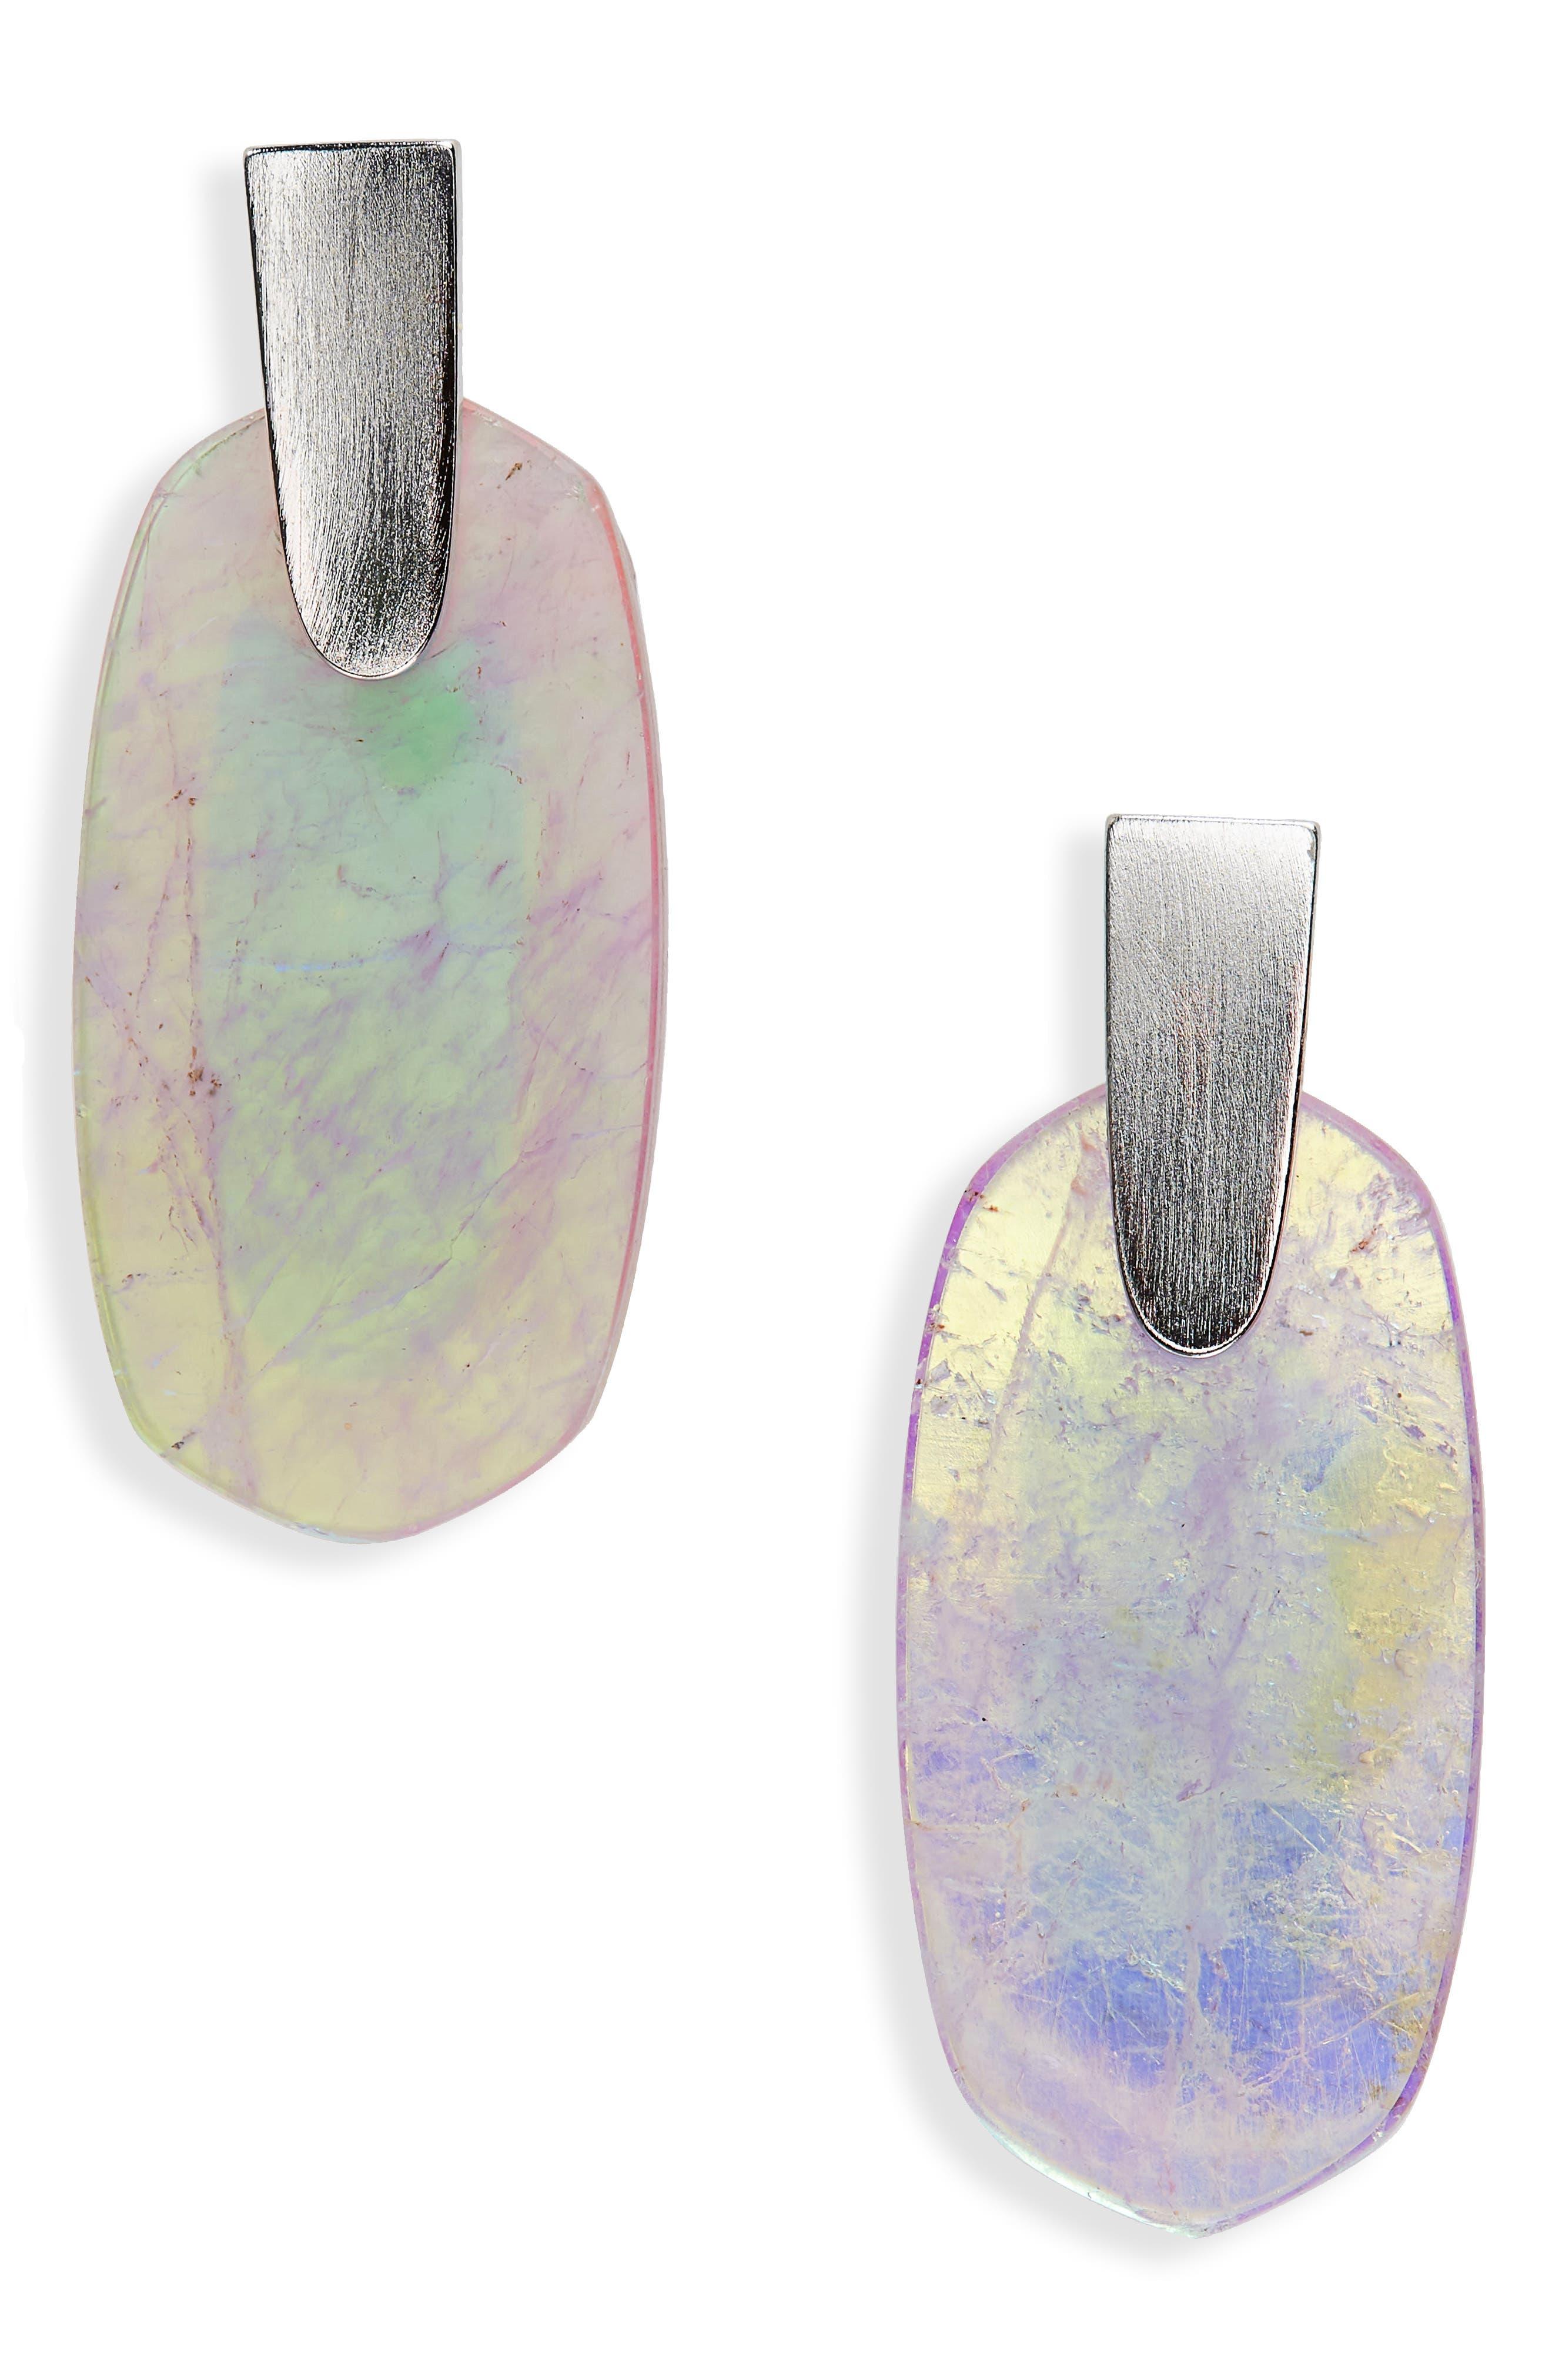 Aragon Drop Earrings,                         Main,                         color, AMETHYST DICHROIC/ SILVER